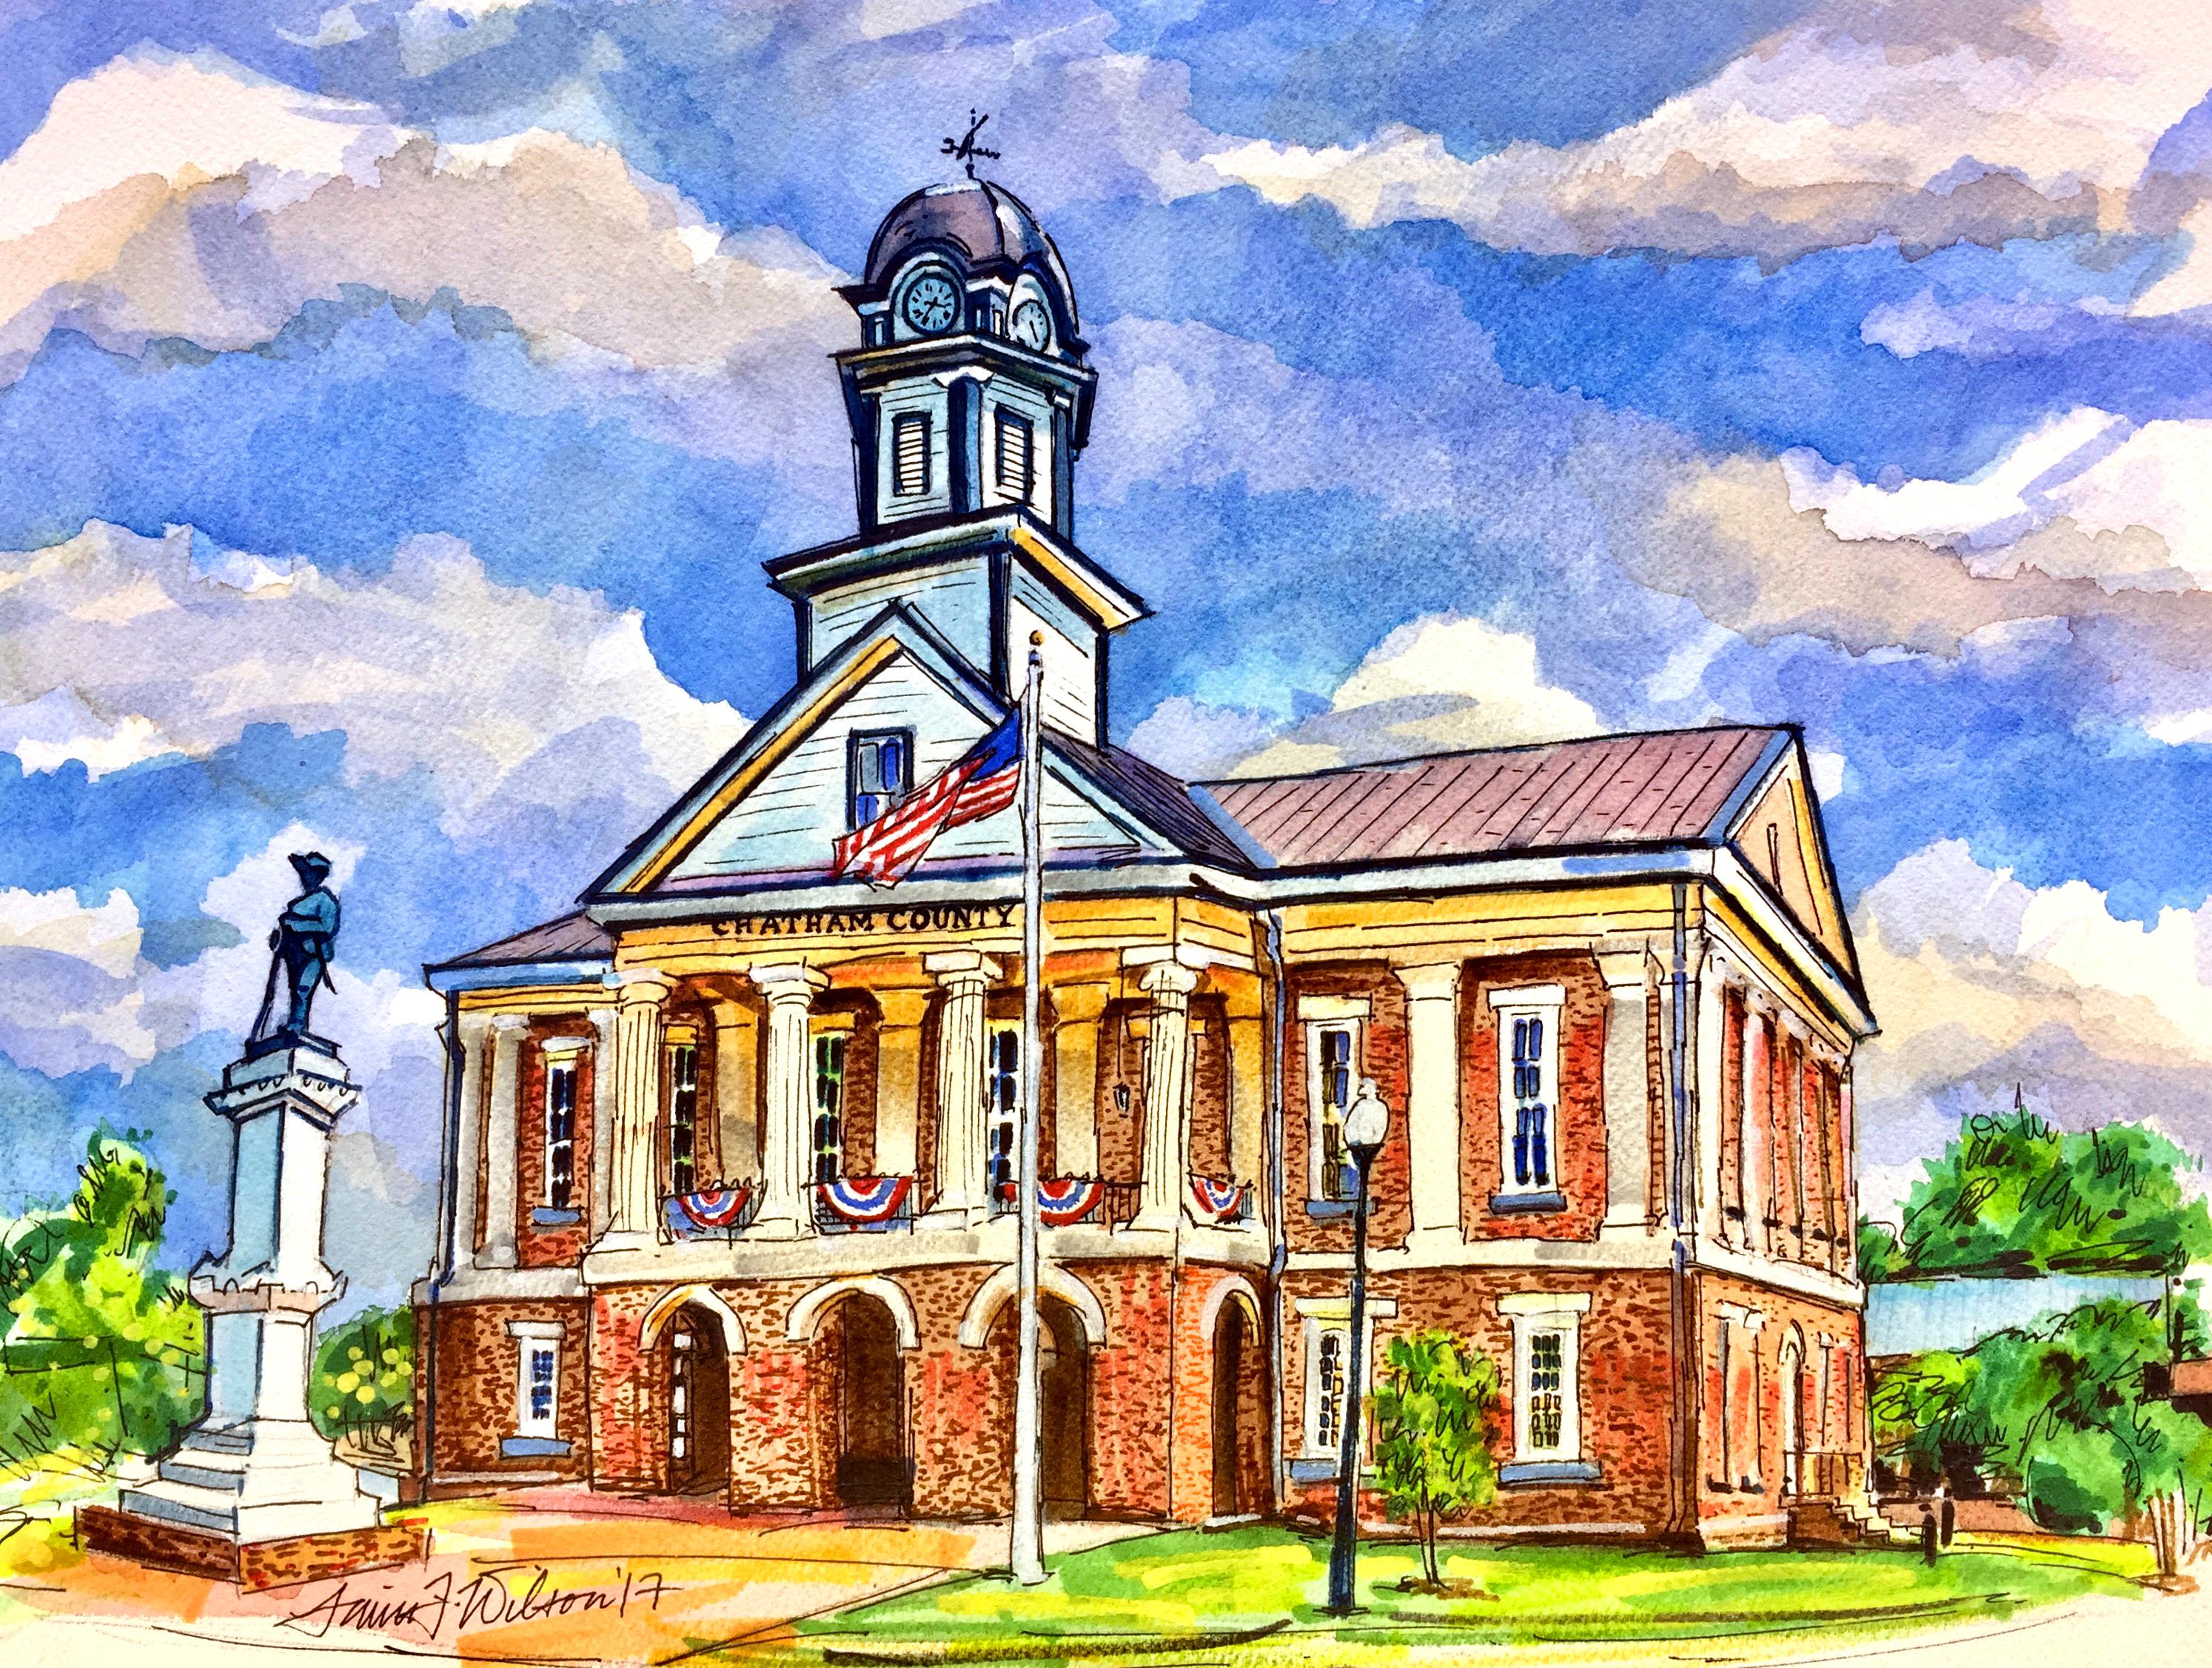 Pittsboro, NC - Courthouse